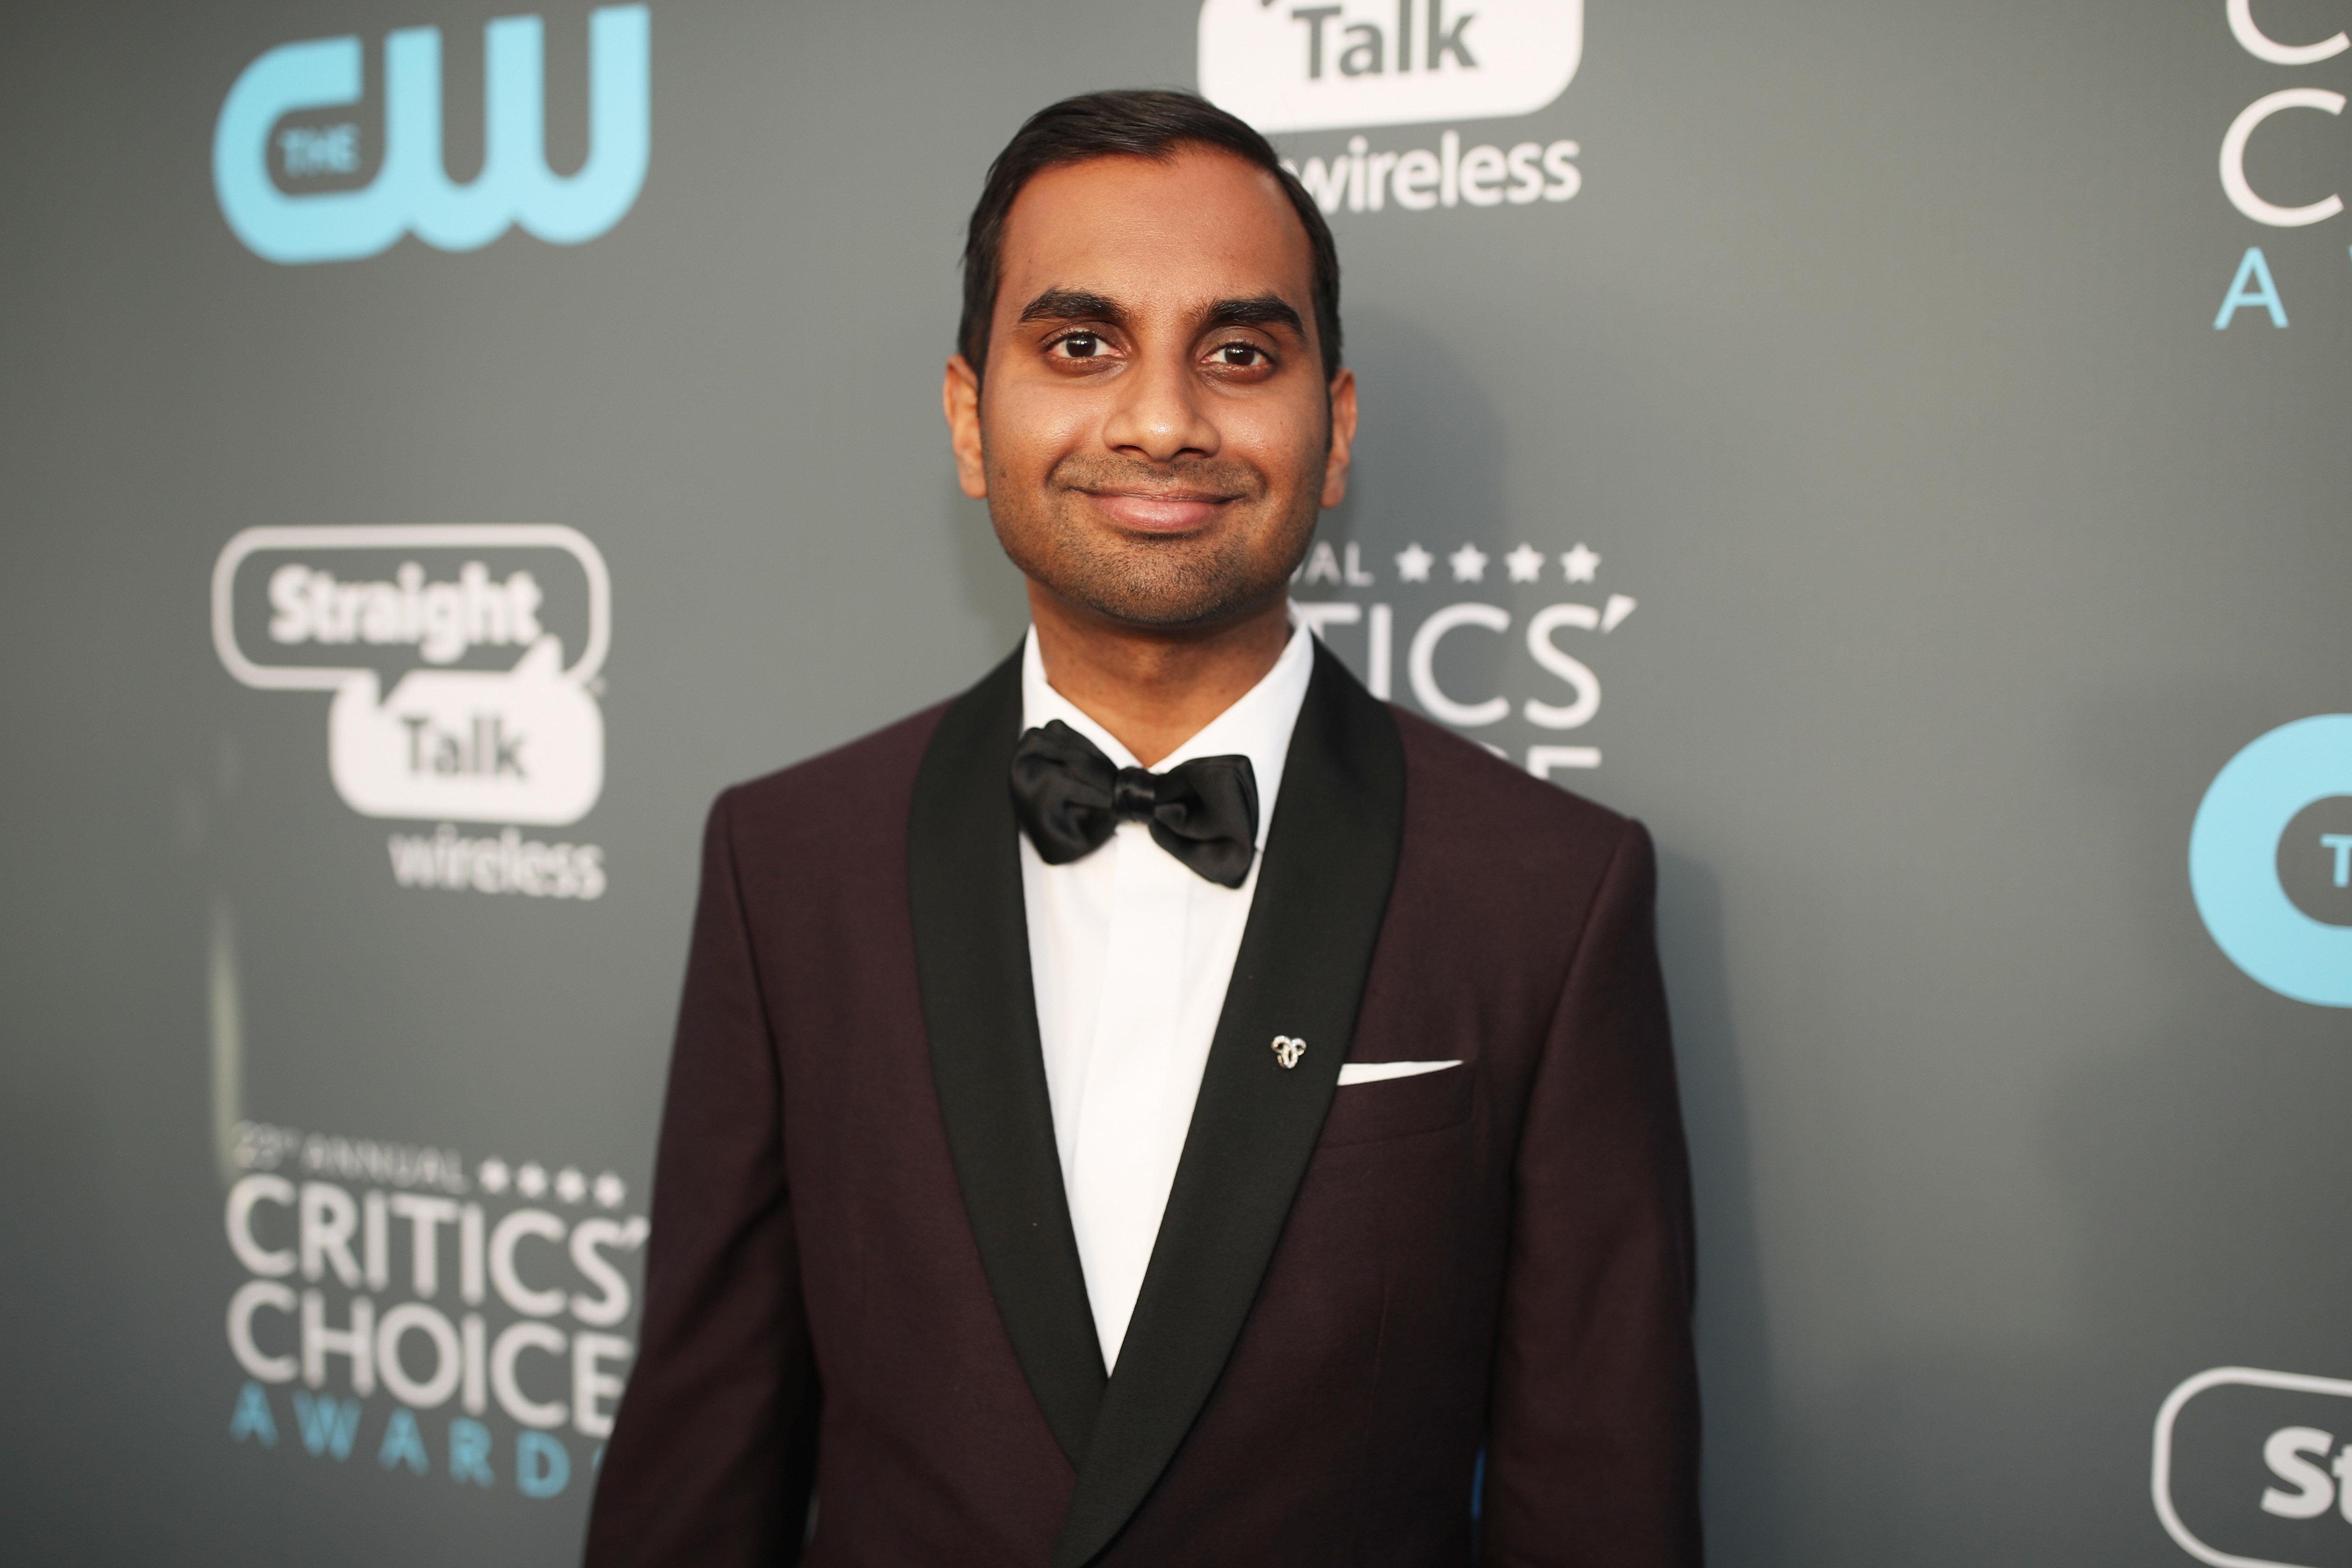 Aziz Ansari Skips 2018 SAG Awards, Receives No Applause When